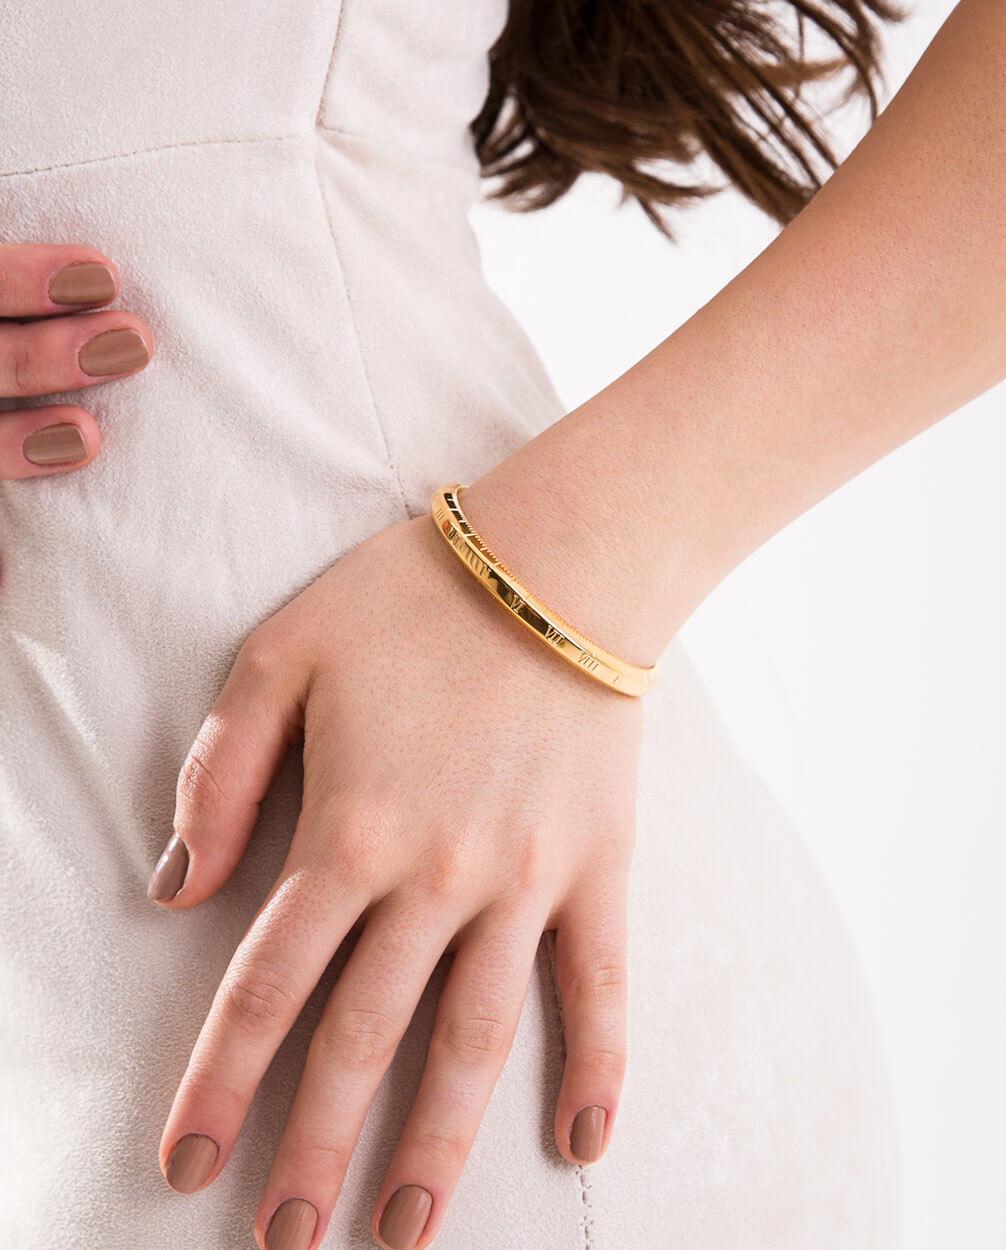 Azari-Gold-Roman-Numeral-Cuff-Bracelet